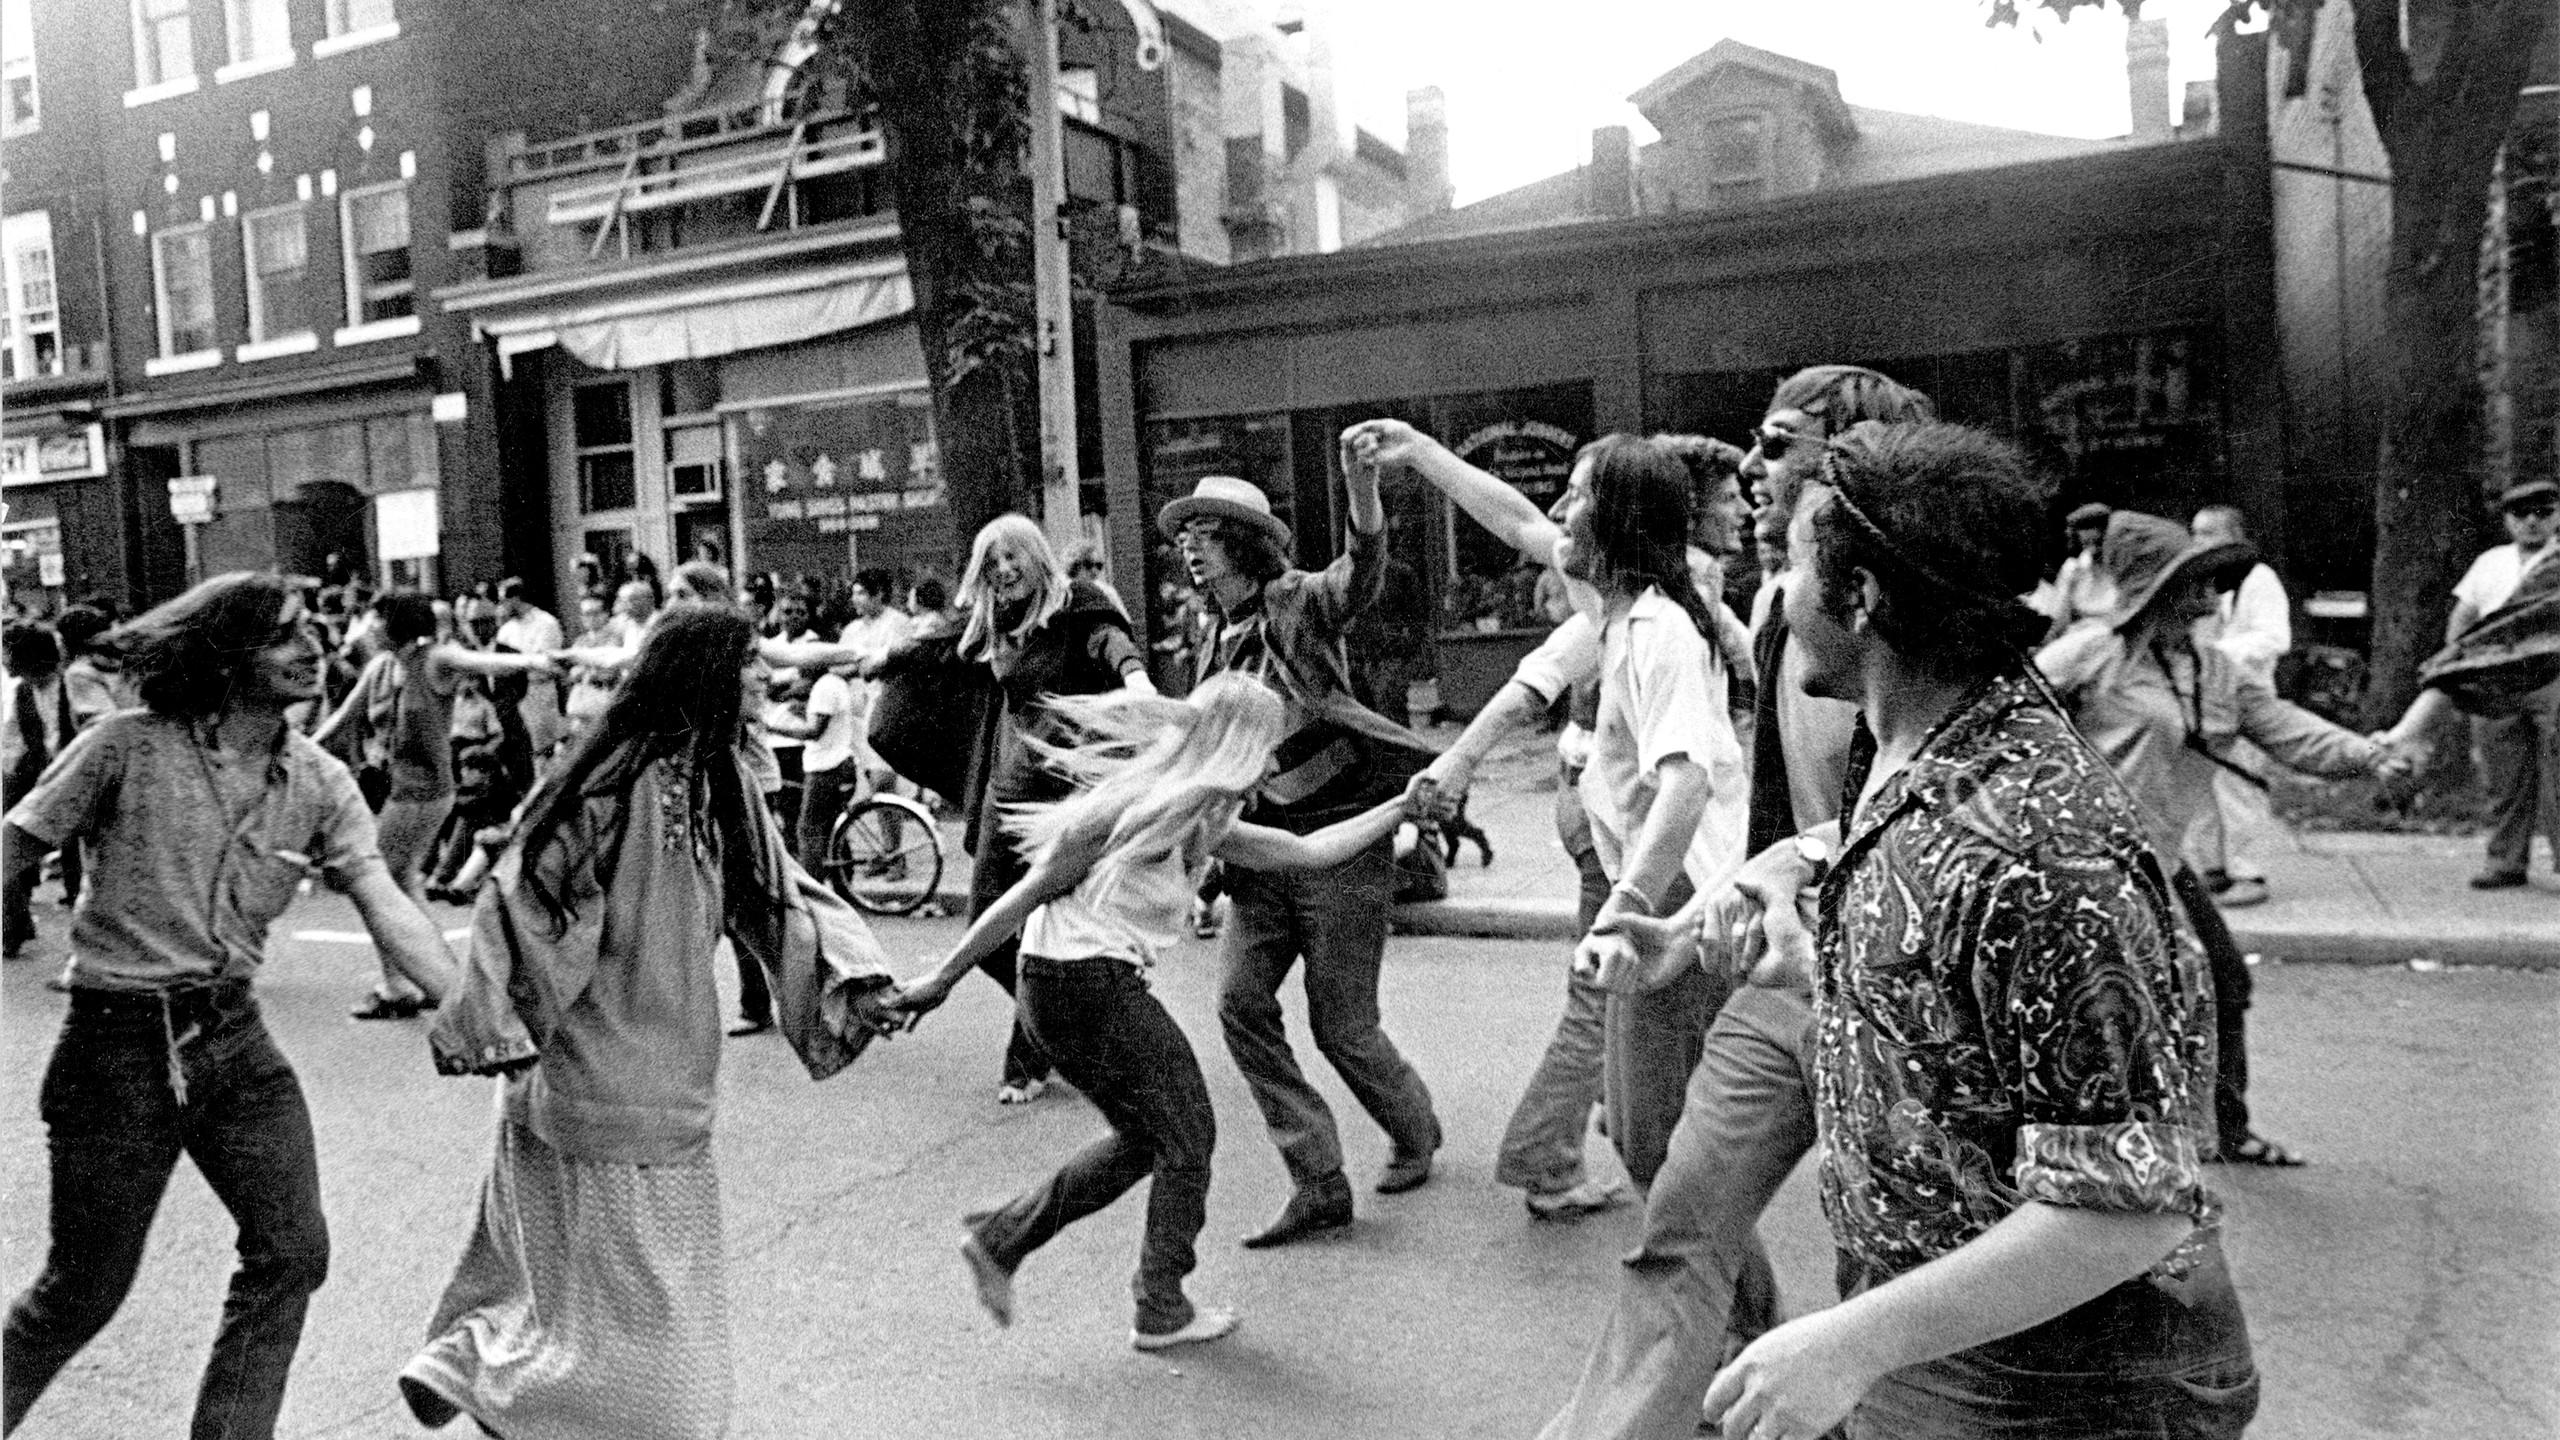 Dance on Balwin St. Toronto